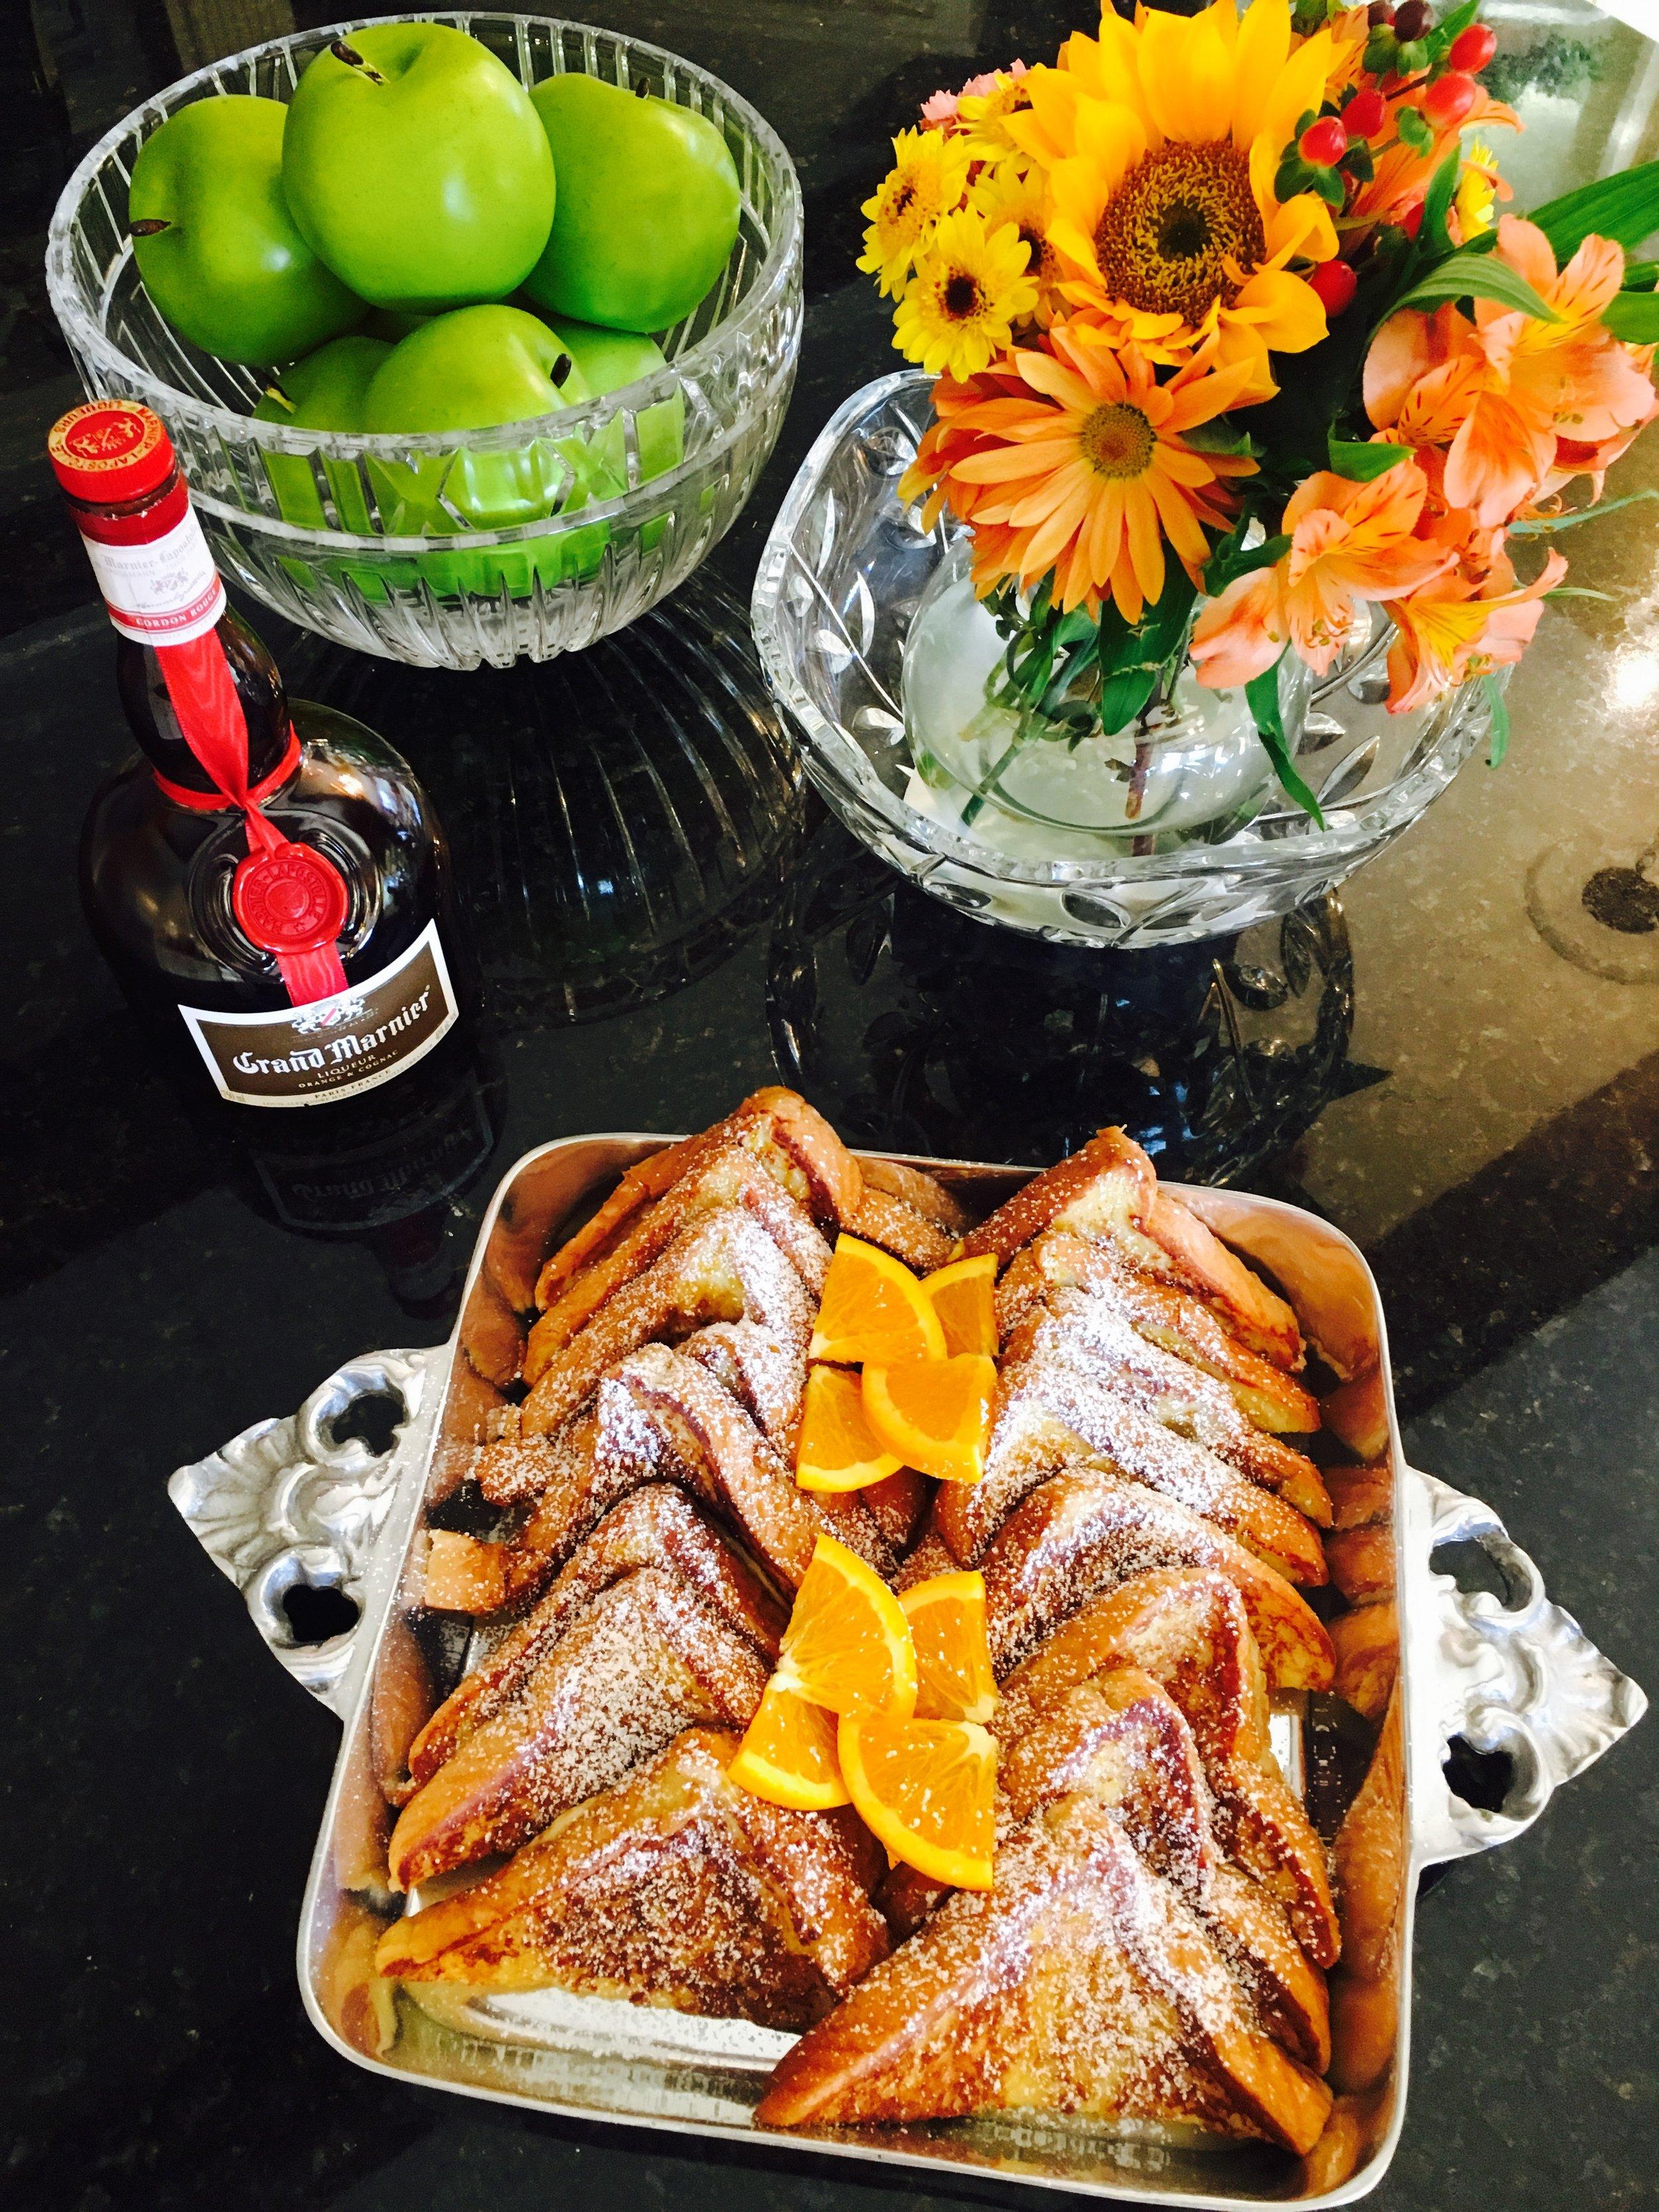 Signature Breakfast - Grand Marnier French Toast